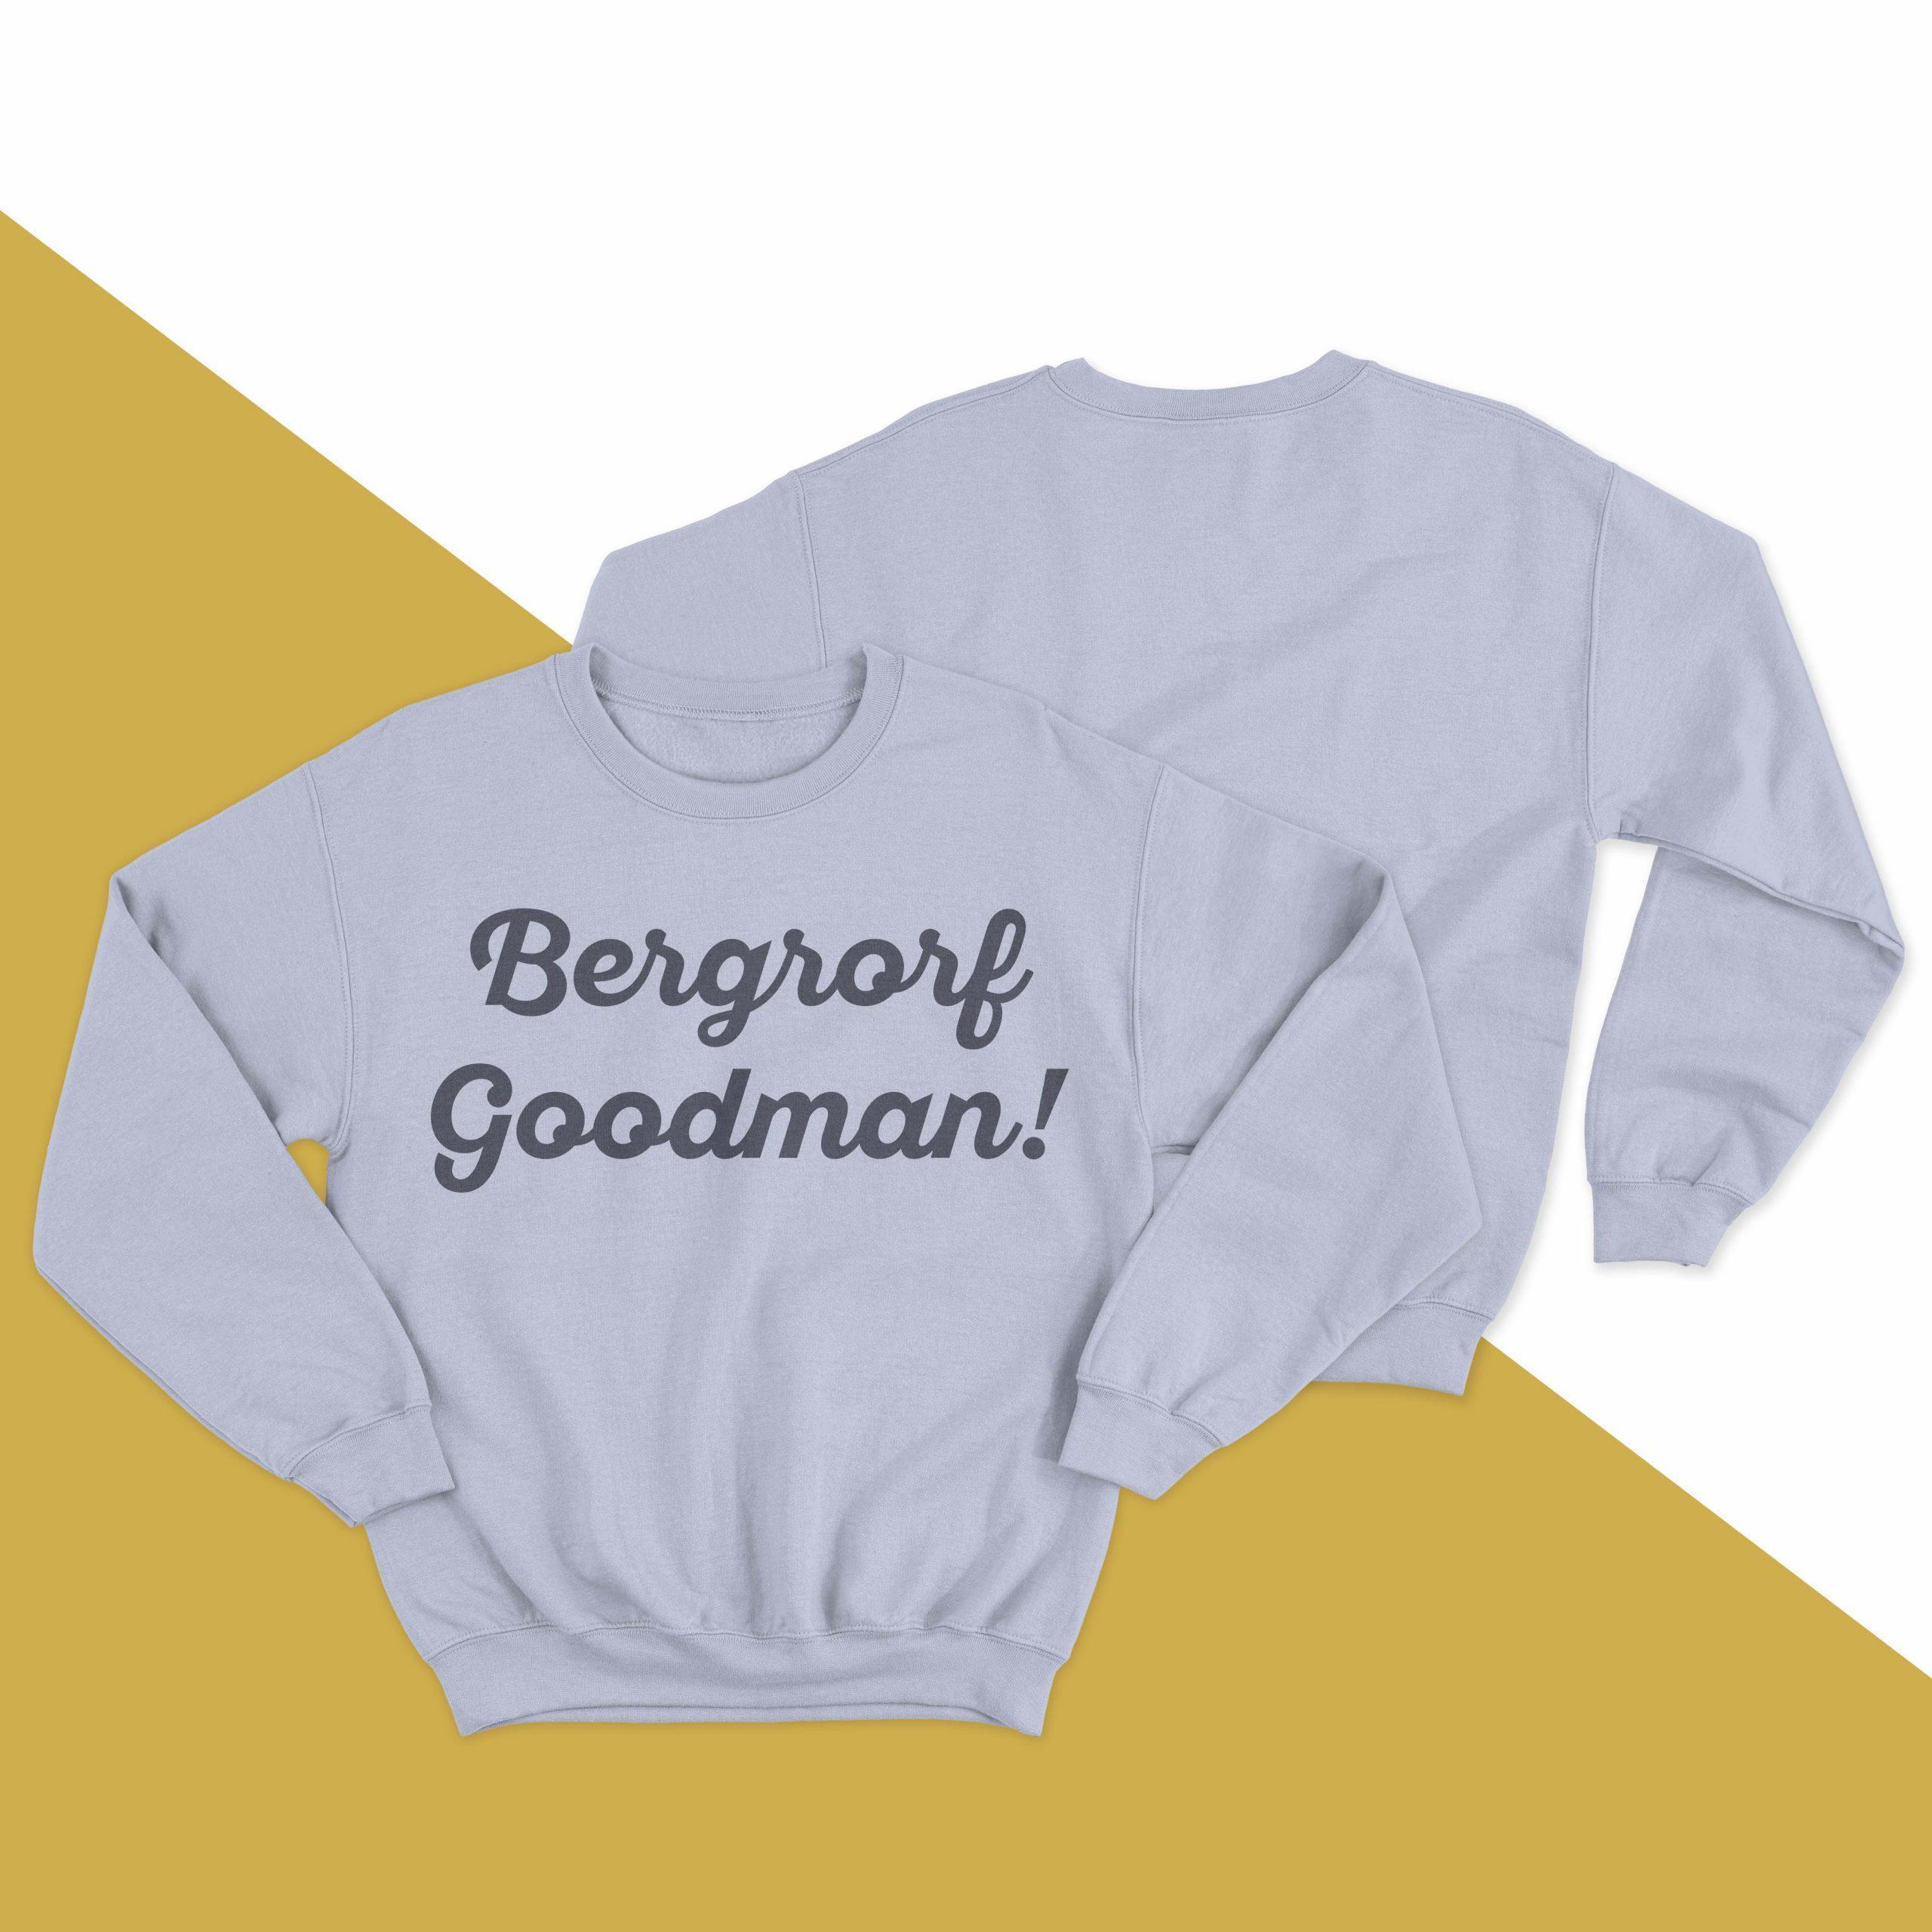 Wendy Williams Bergdorf Goodman T Longsleeve